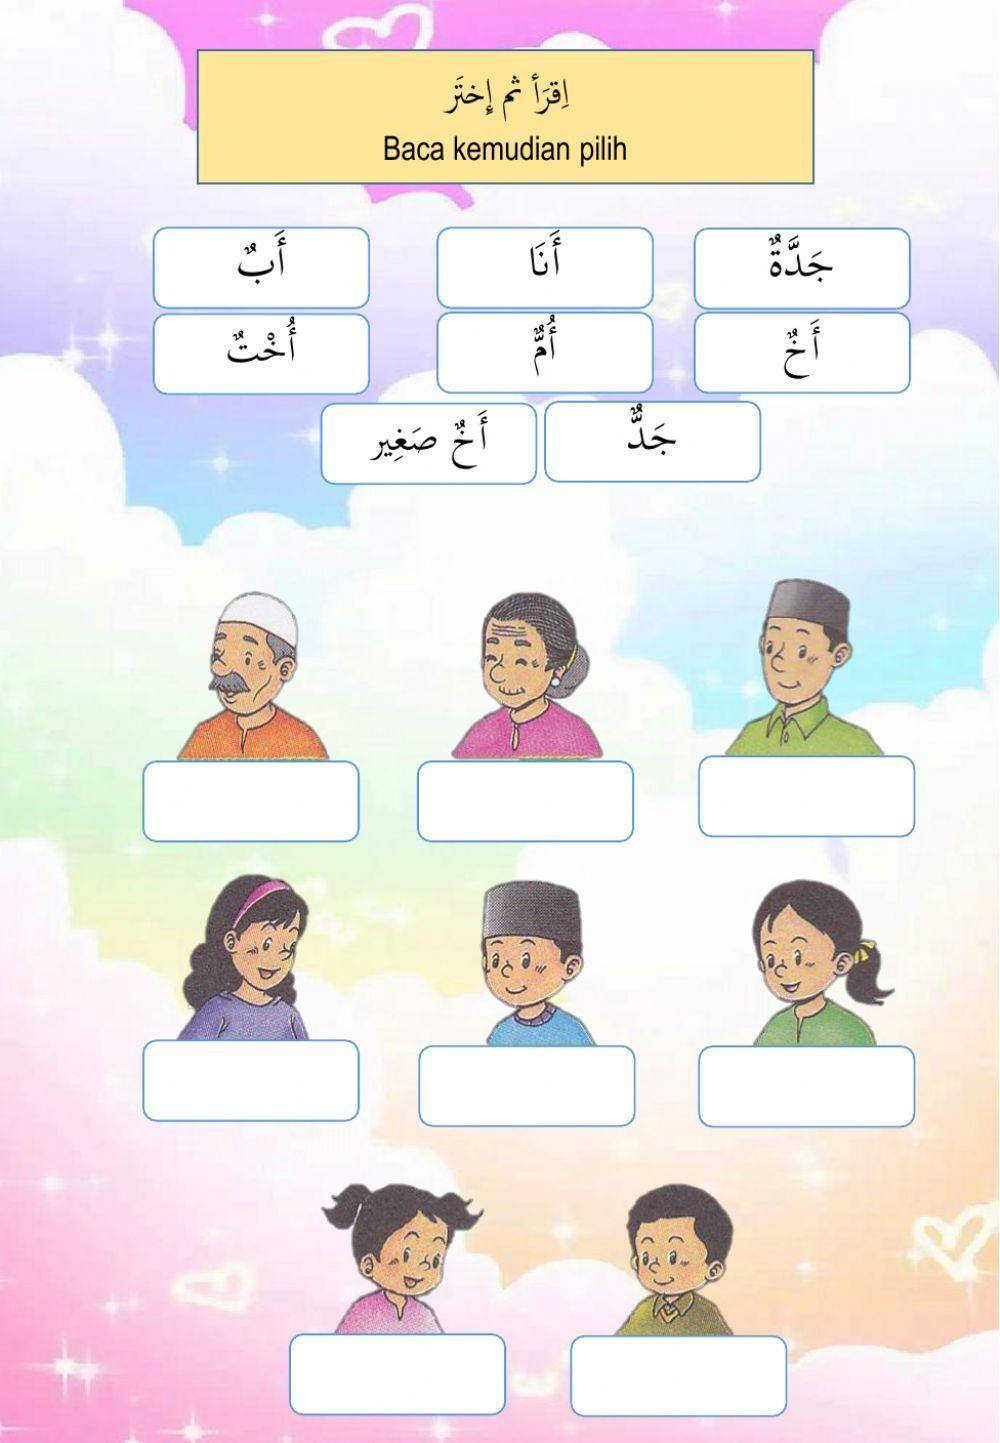 Mengenal Ahli Keluarga Interactive Exercise For Tahun 2 You Can Do The Exercises Online Or Download T Arabic Kids Arabic Alphabet For Kids Learn Arabic Online